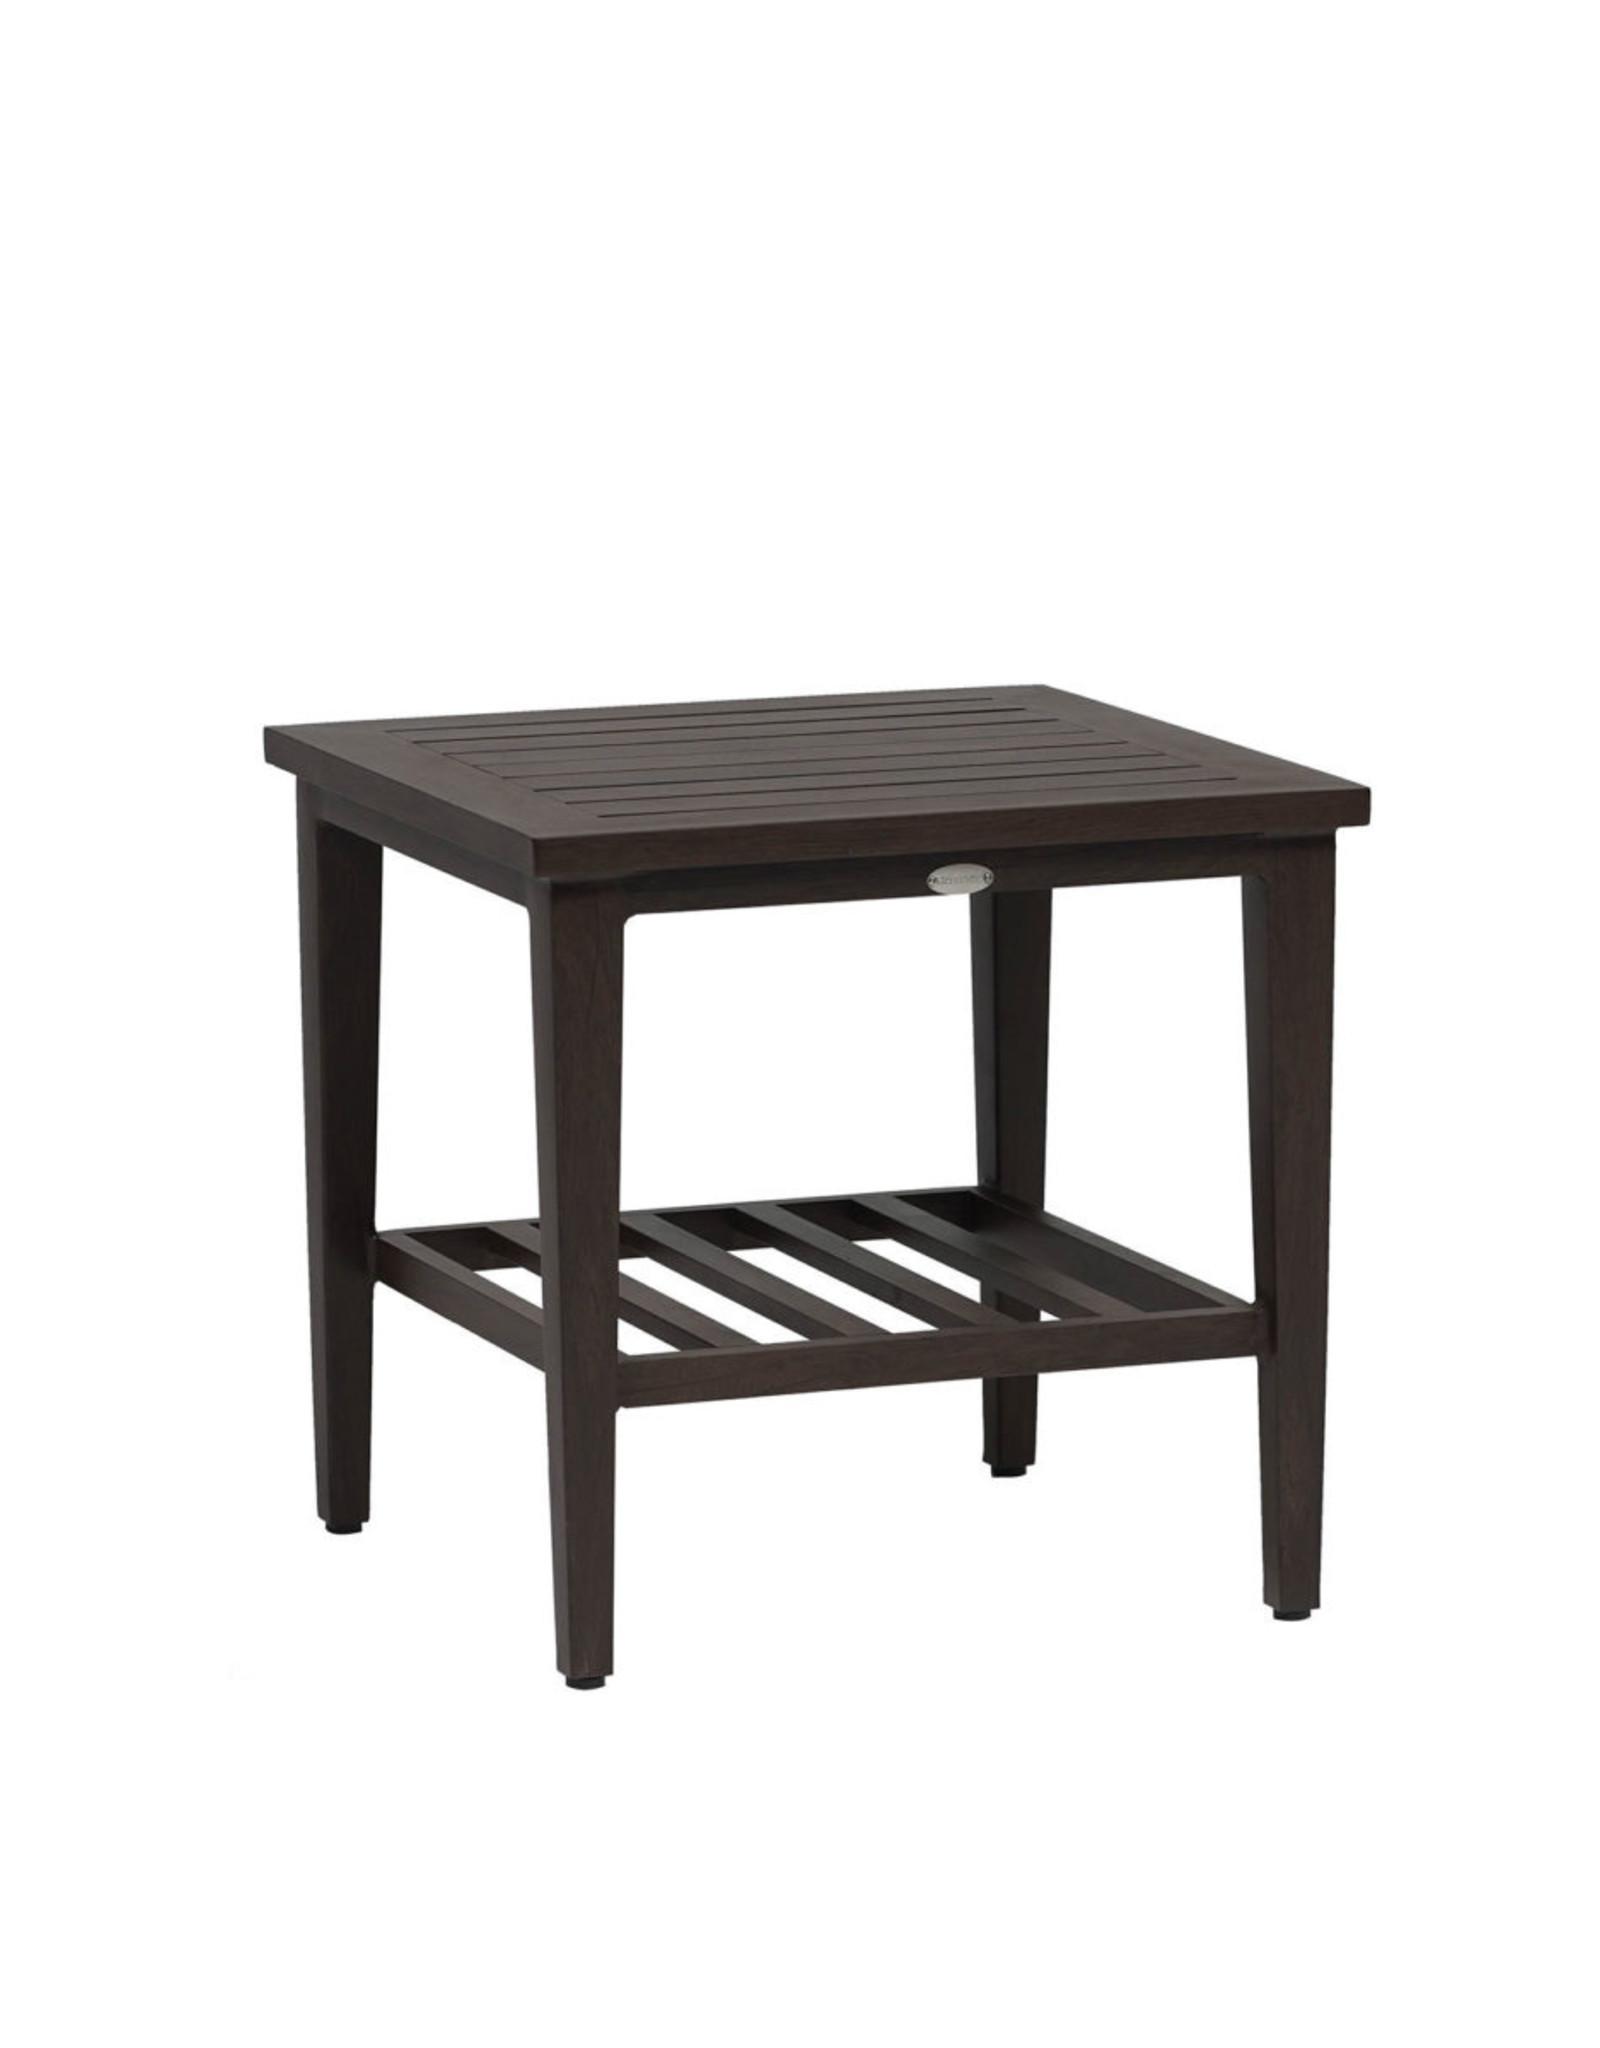 Ratana Ratana Biltmore End Table FN61705HGA